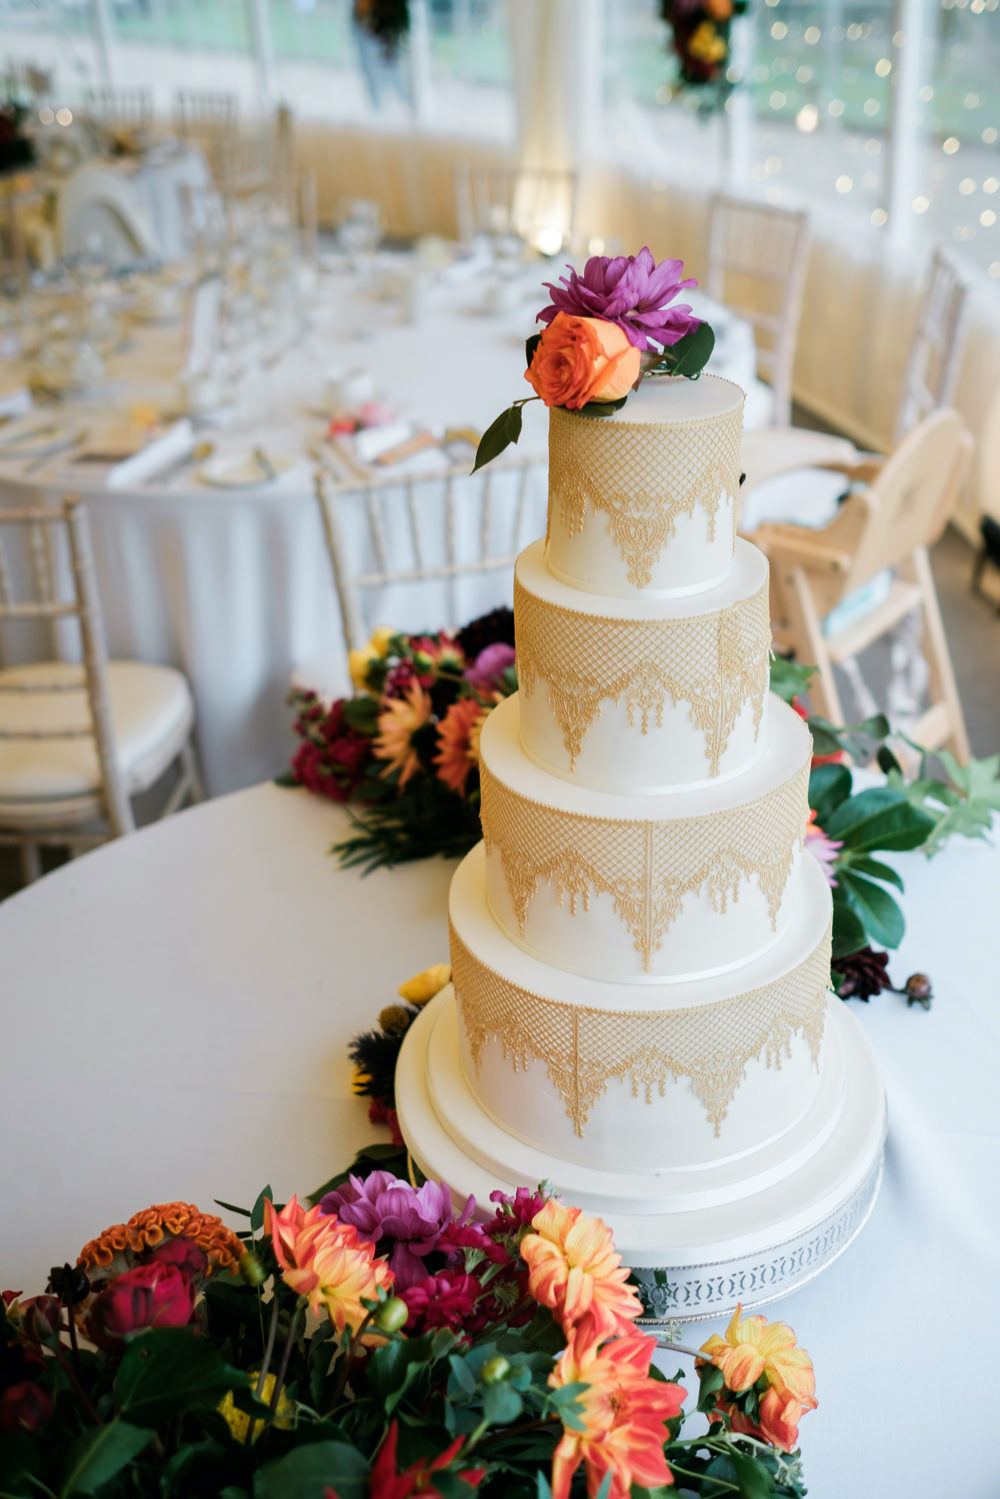 Gold Cake Tall Flowers Glenarm Castle Wedding Jonathan Ryder Photography